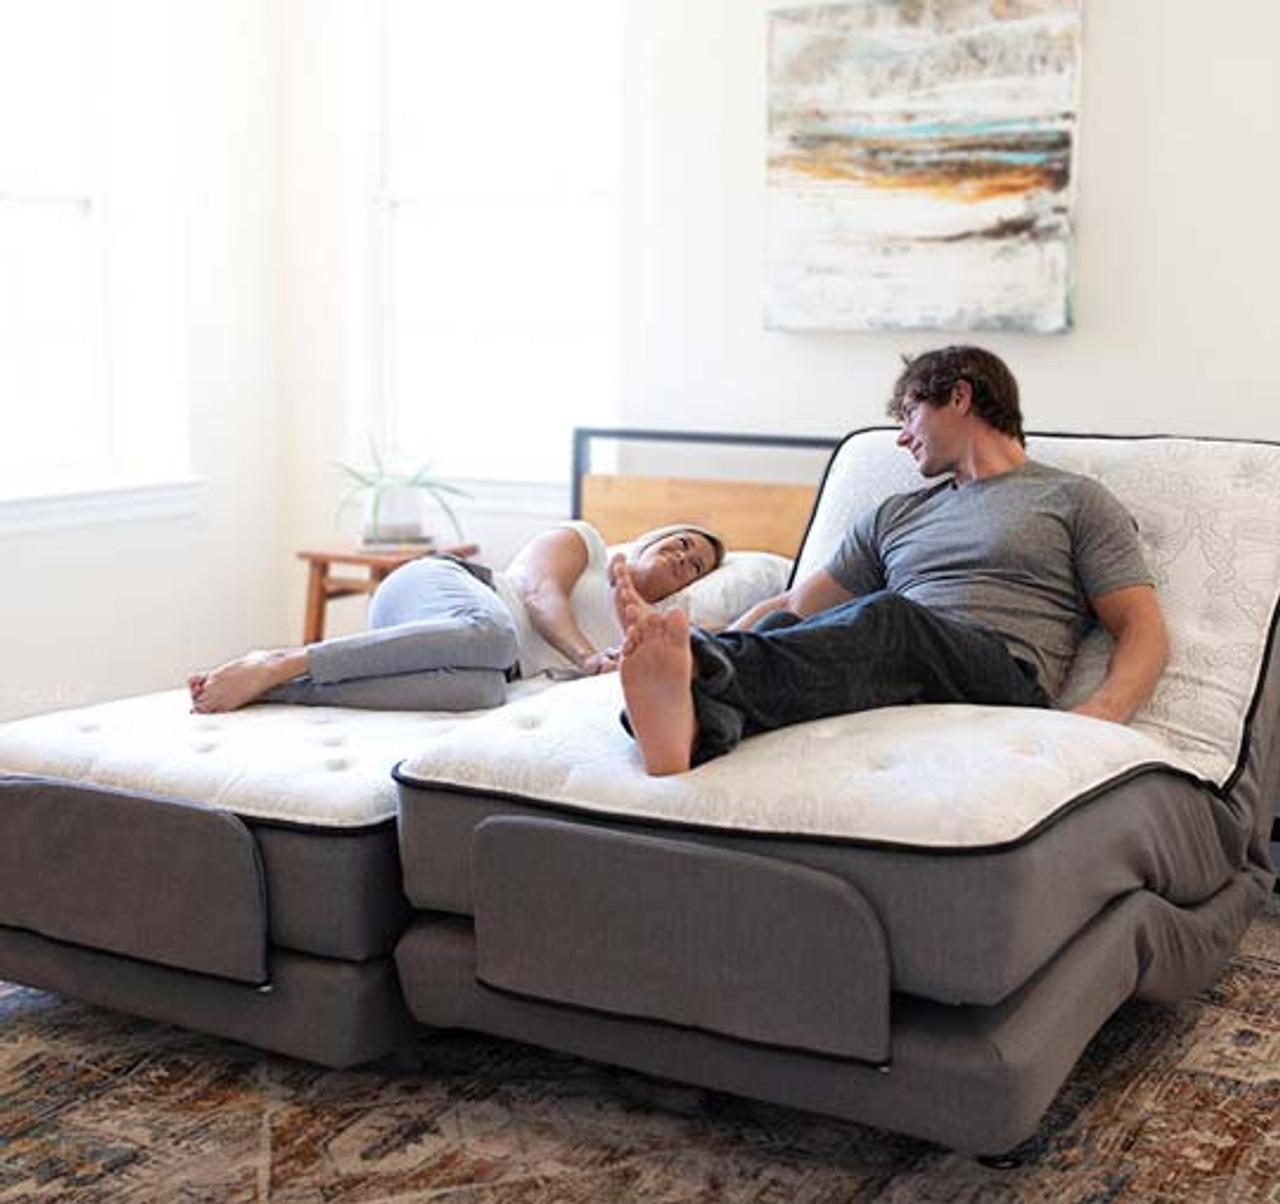 Picture of: Flex A Bed Adjustable Hospital Beds Premier Twin Full Split Queen Split King